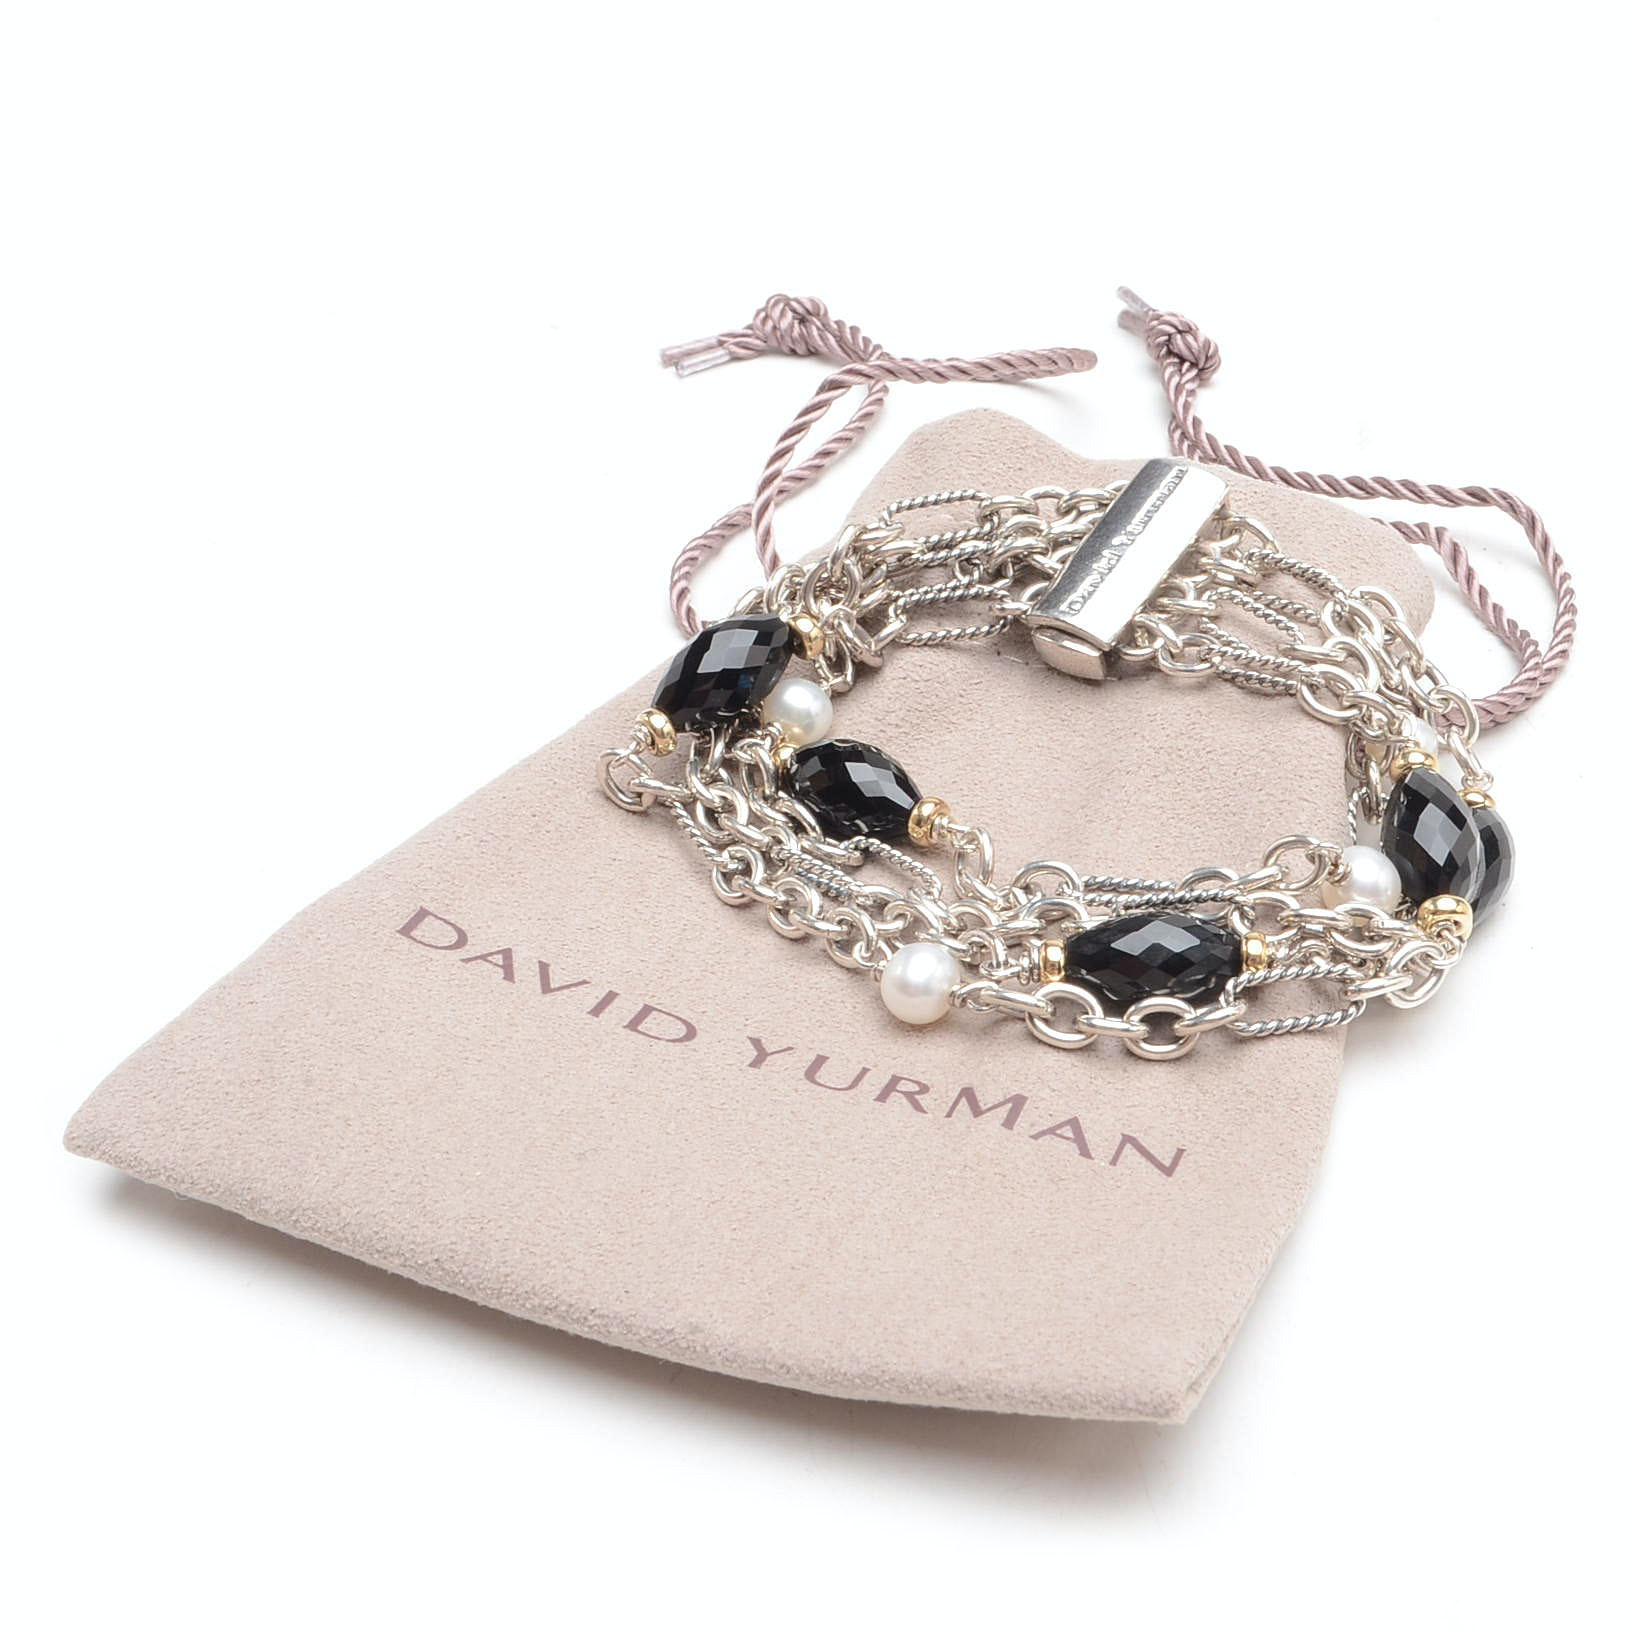 David Yurman Sterling Silver, Onyx and Pearl Bracelet